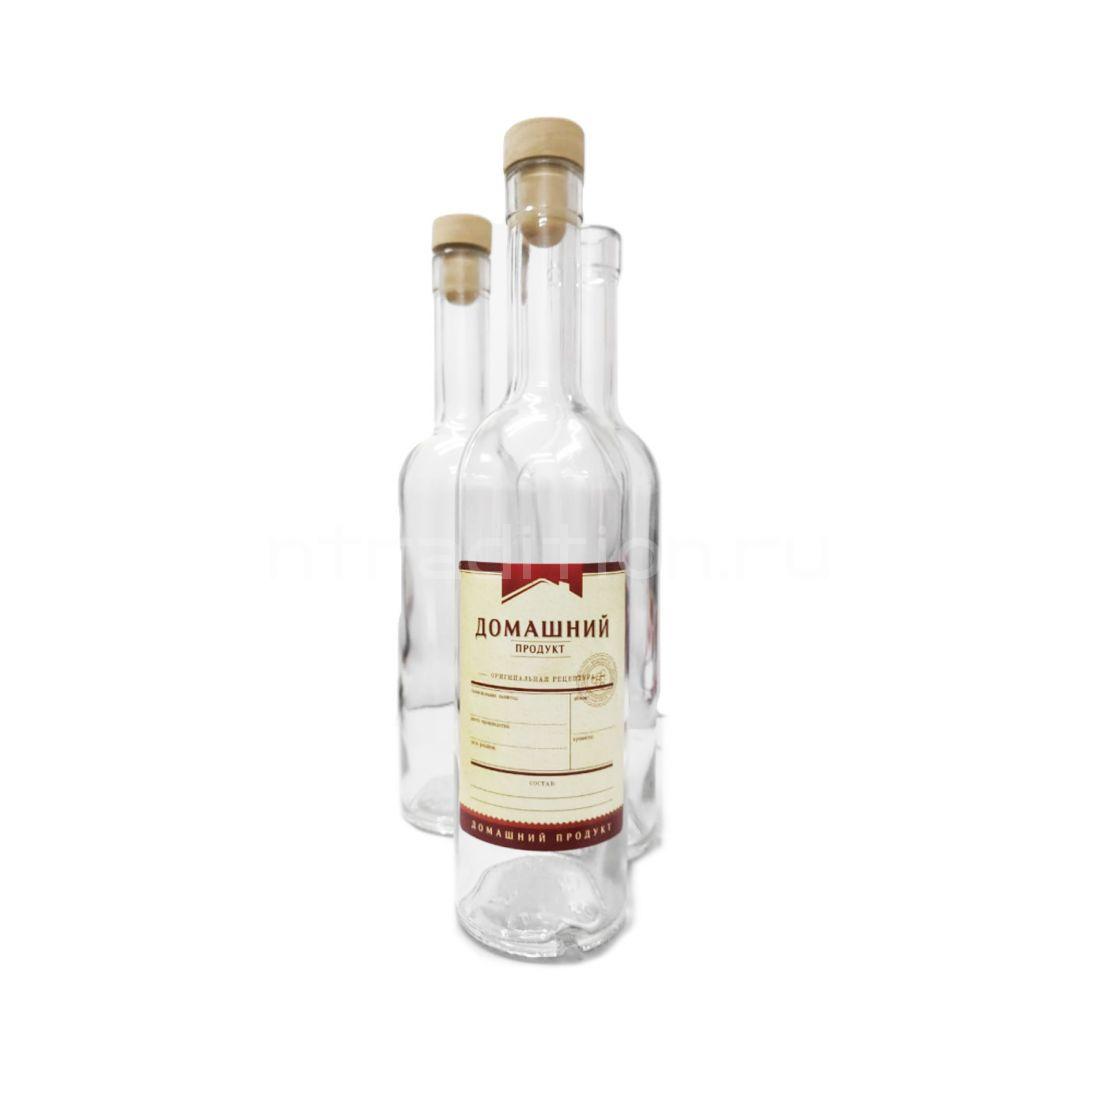 Бутылка Оригинальная, 0,25 л / 25 штук (Камю)